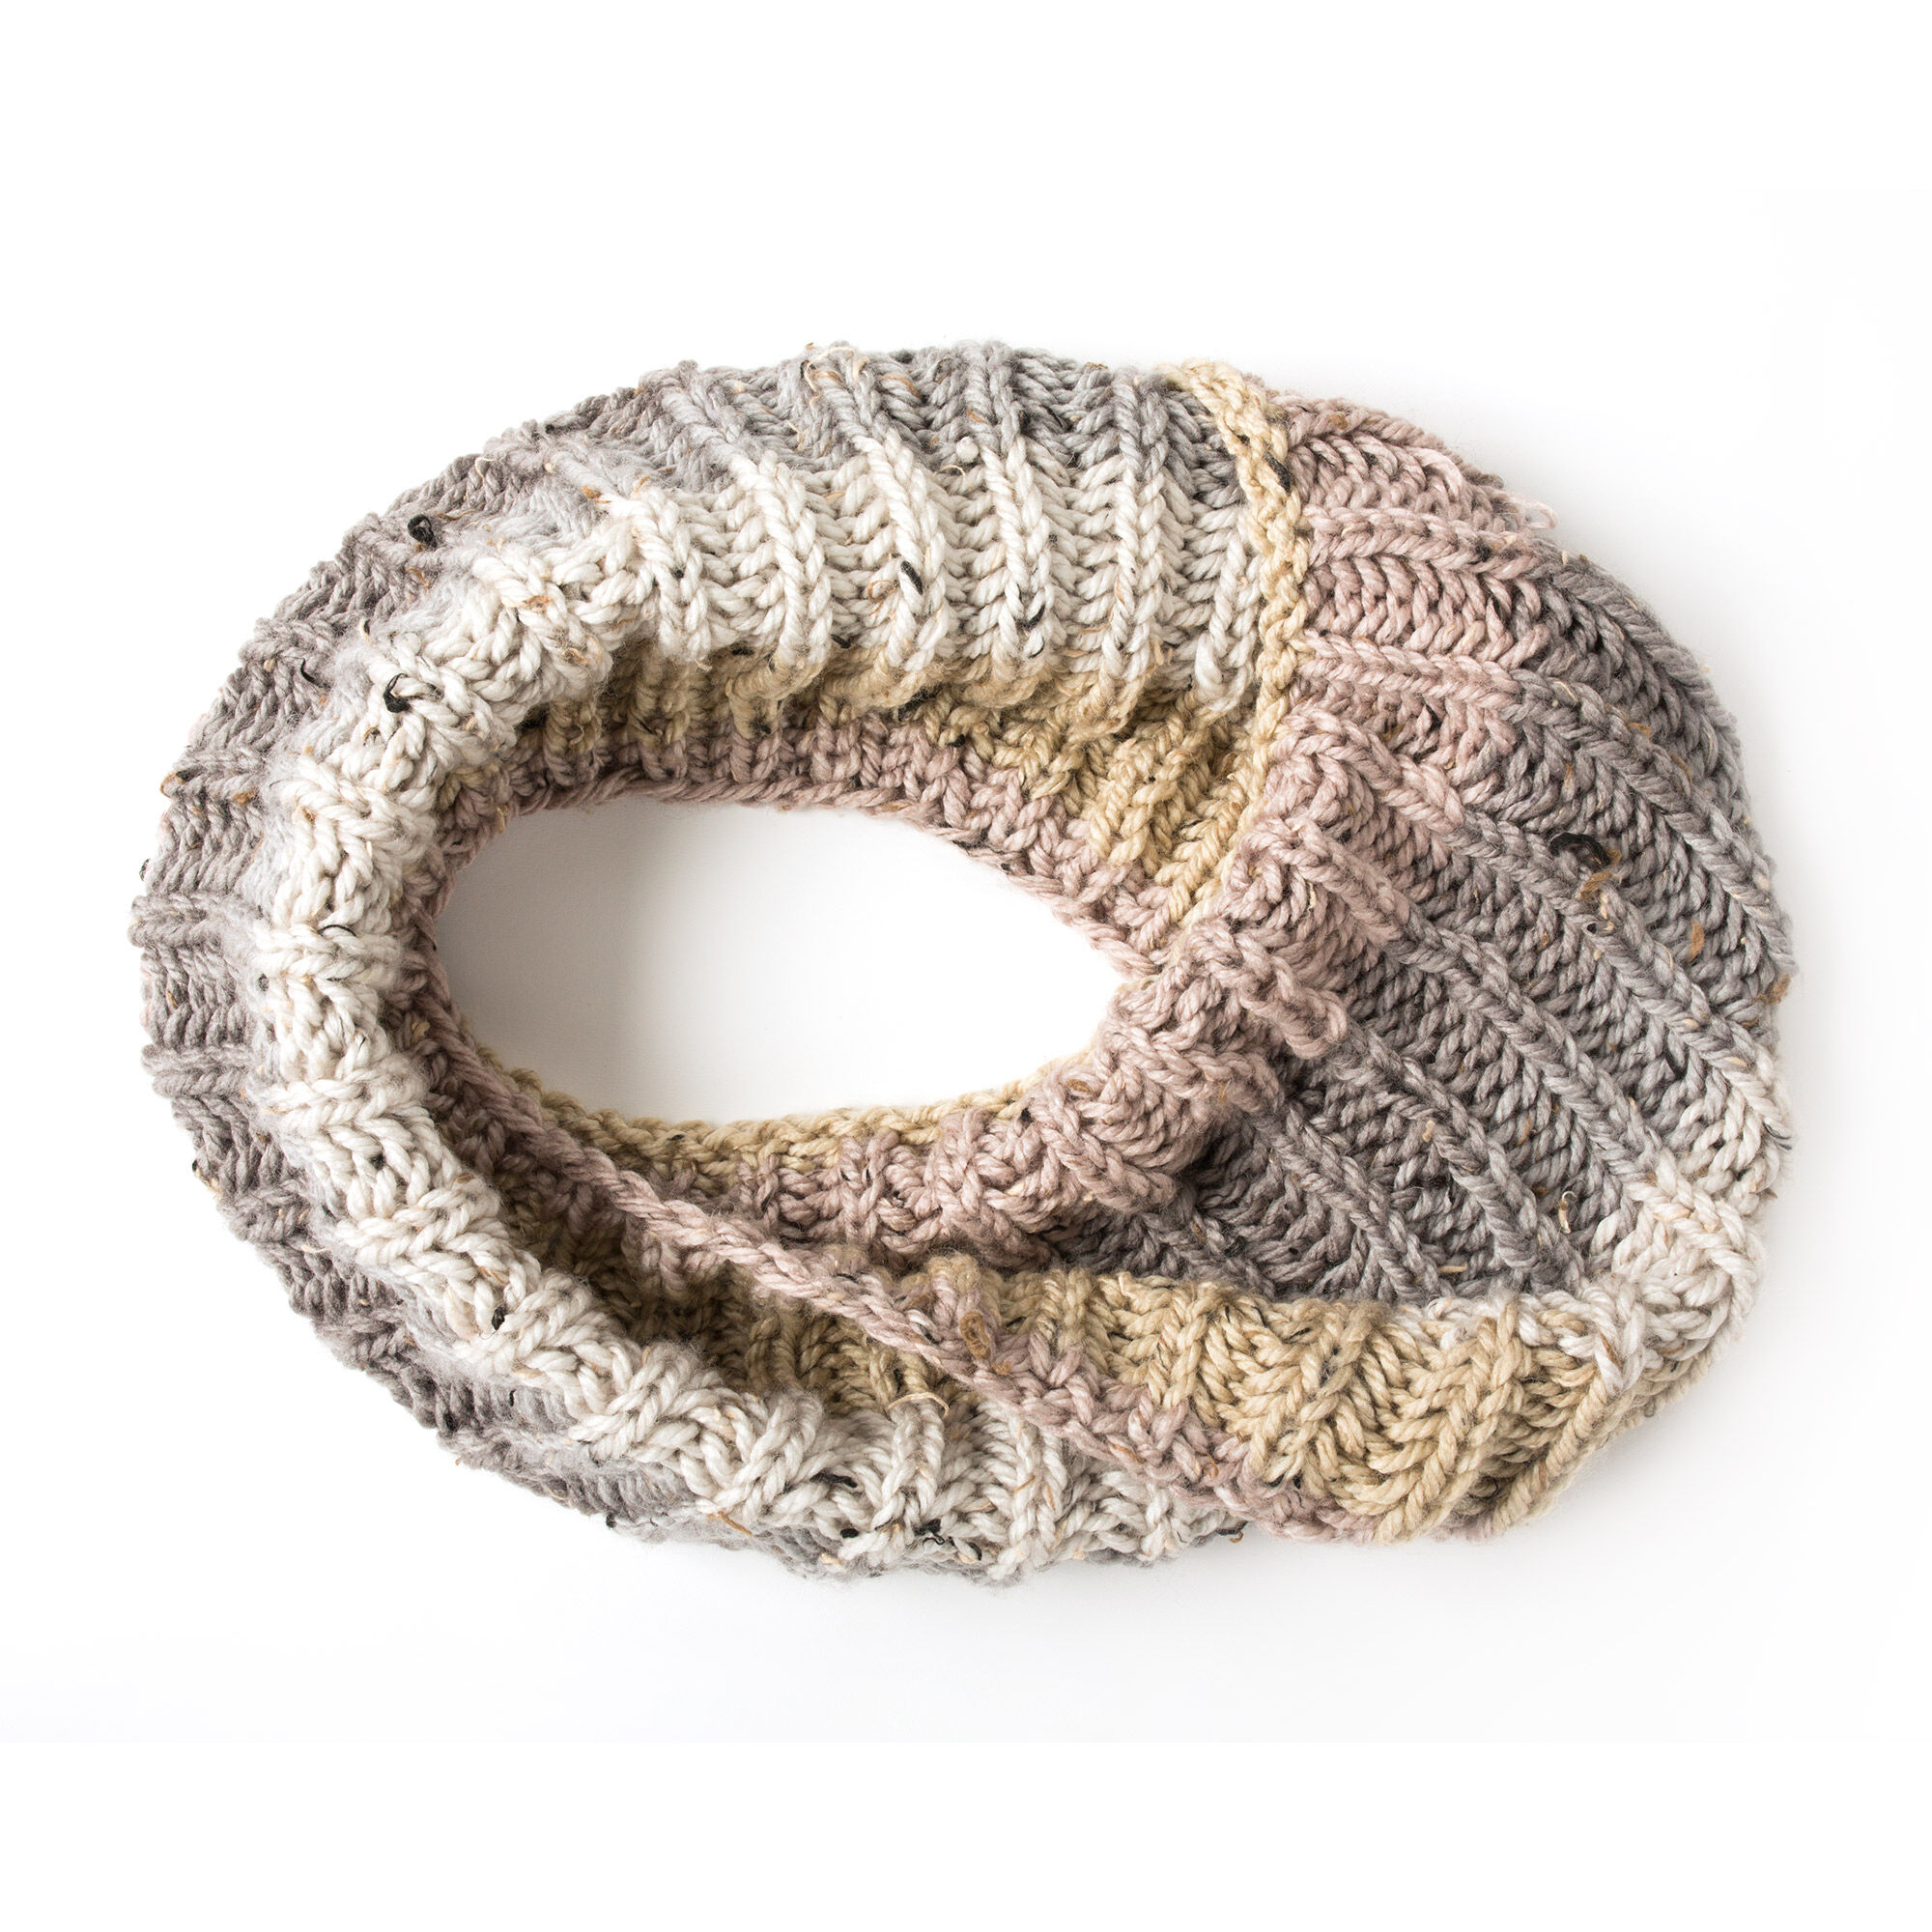 Caron Big Rib Knit Cowl Pattern   Yarnspirations